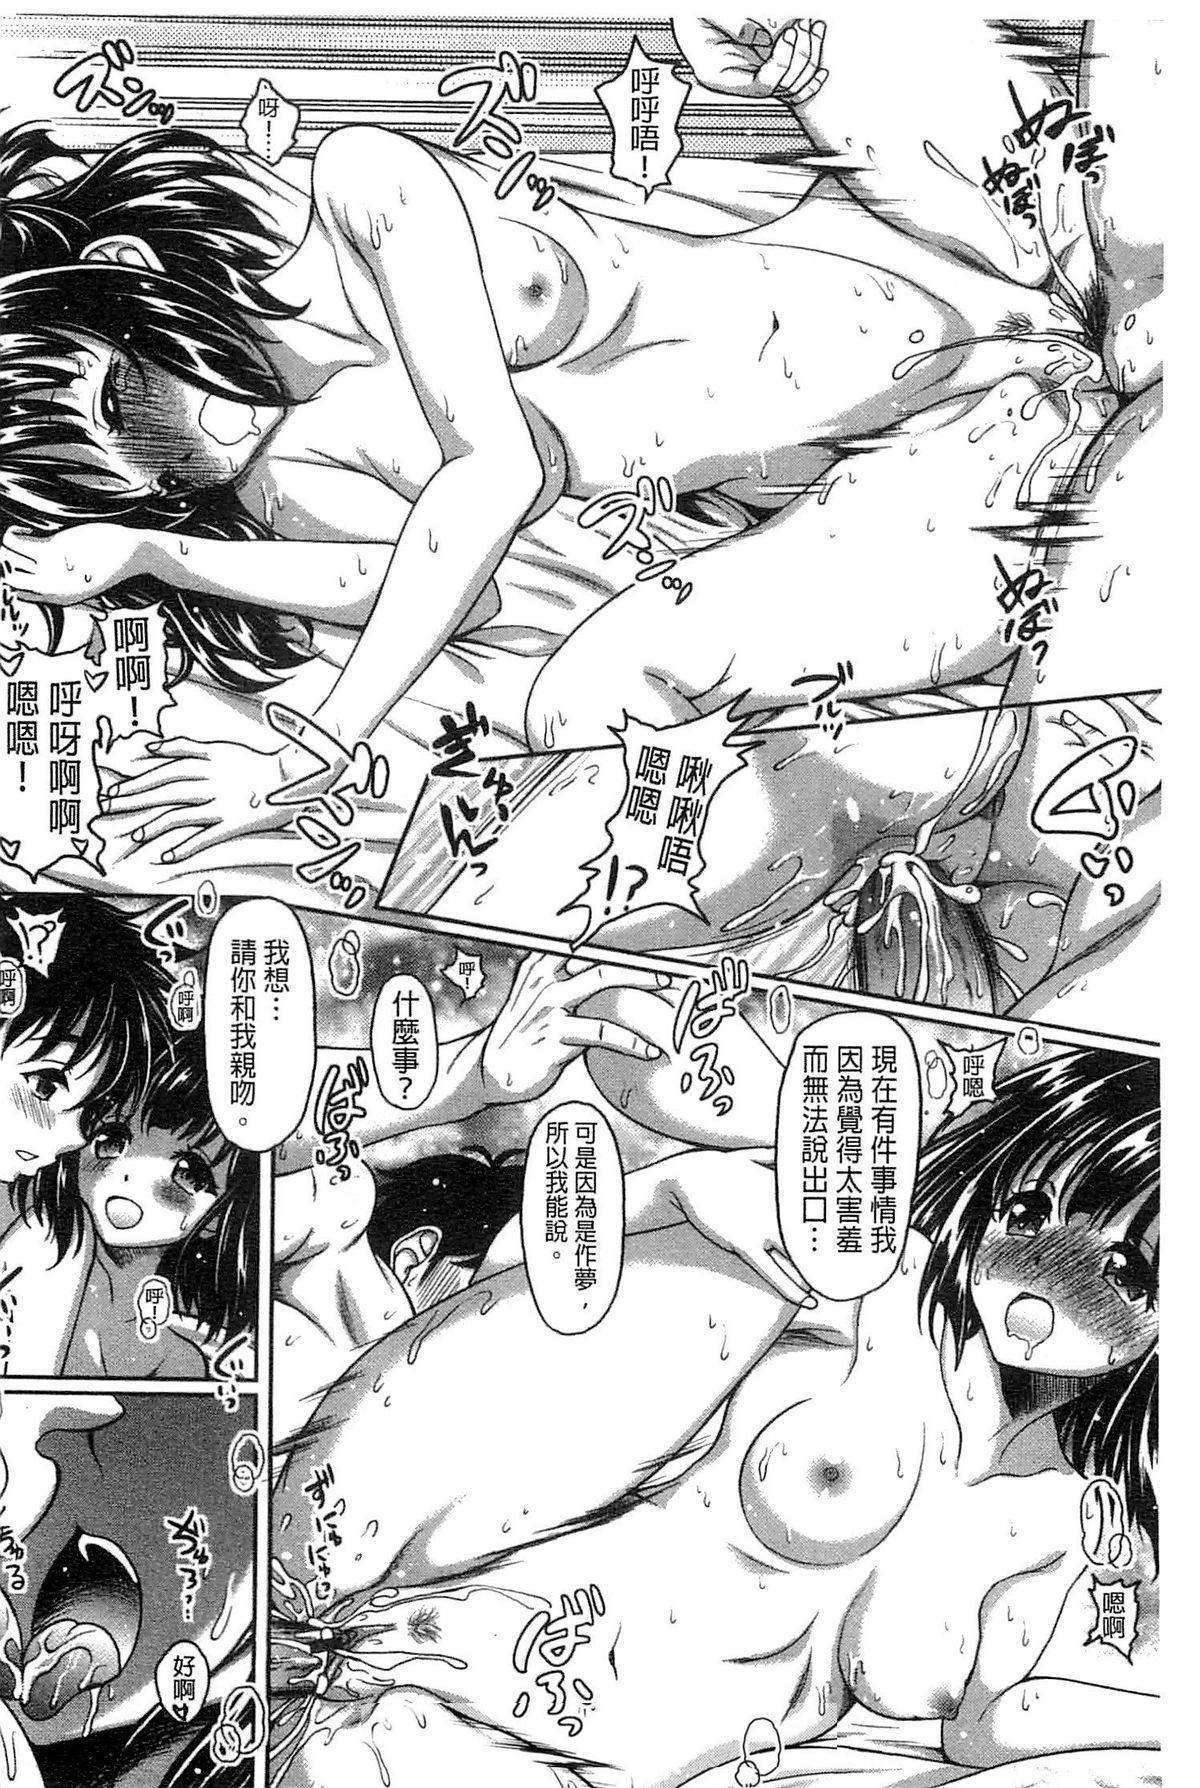 Hajimete nan dakara - First sexual experience 94